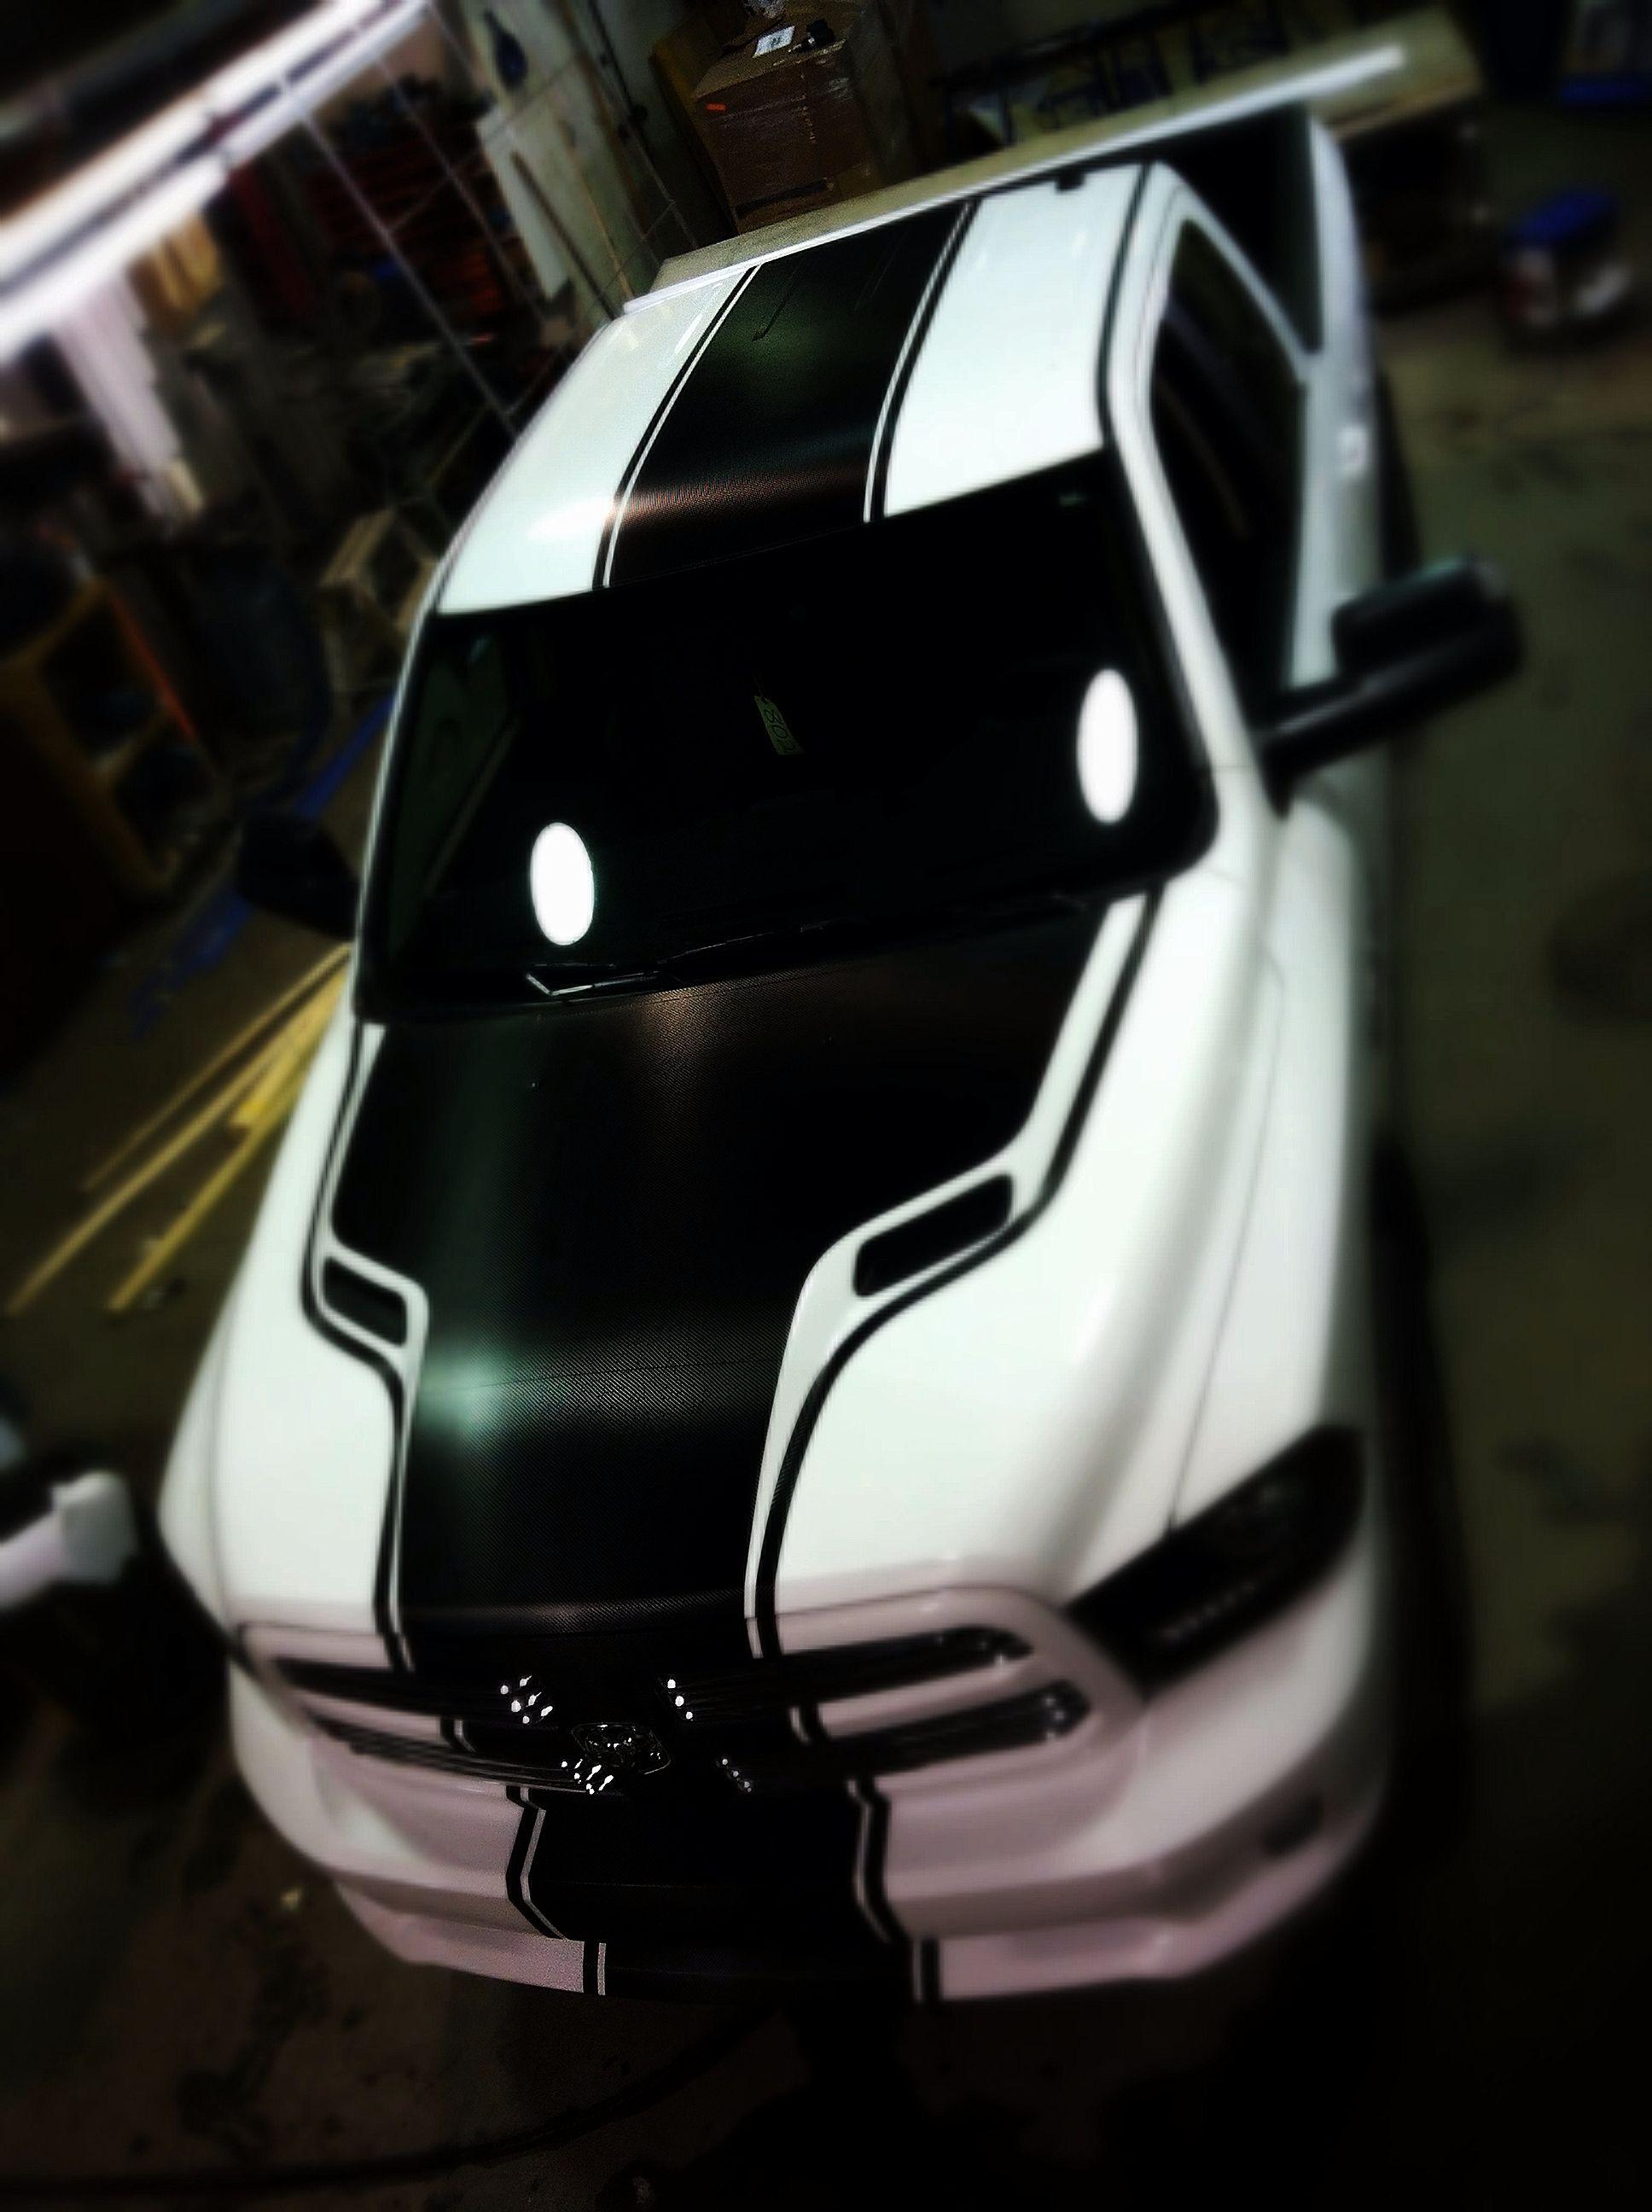 Racing Stripes Fait A La Main Ram 1500 Dodge Trucks Ram Dodge Ram Pickup Dodge Ram Accessories